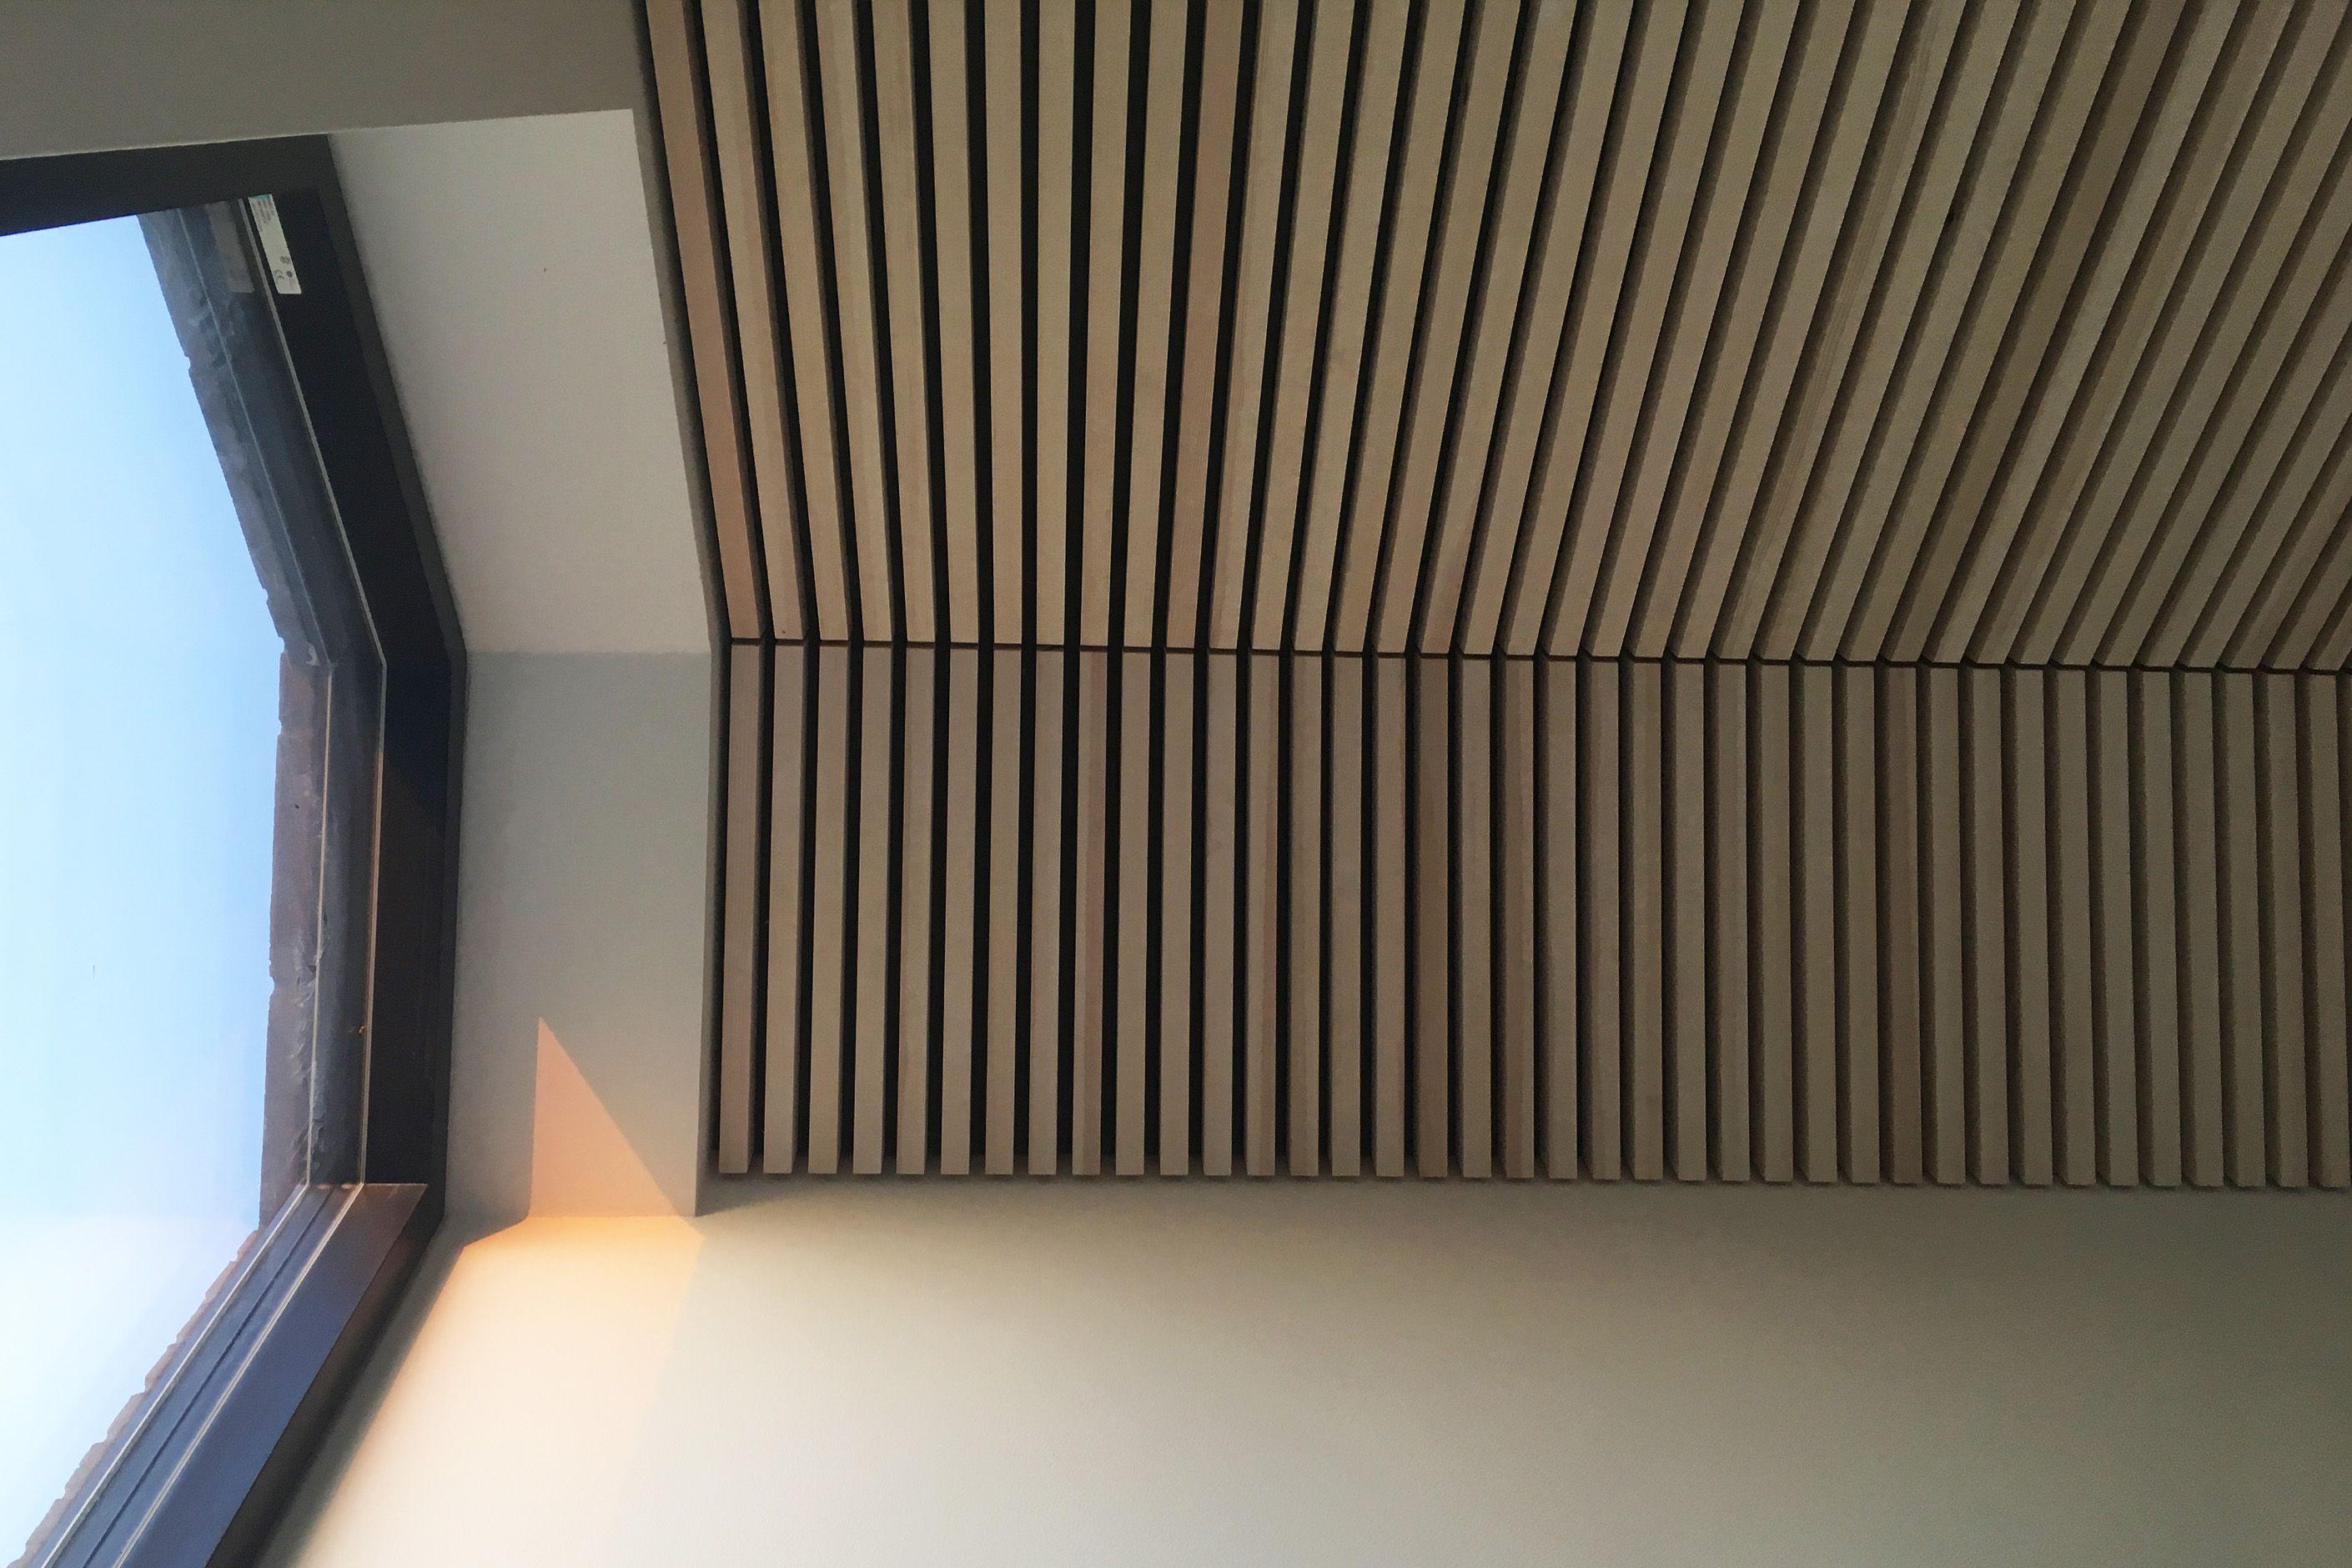 Alvorlig listeloft.nu / akustik lofter i træ lister | listeloft.nu GZ94